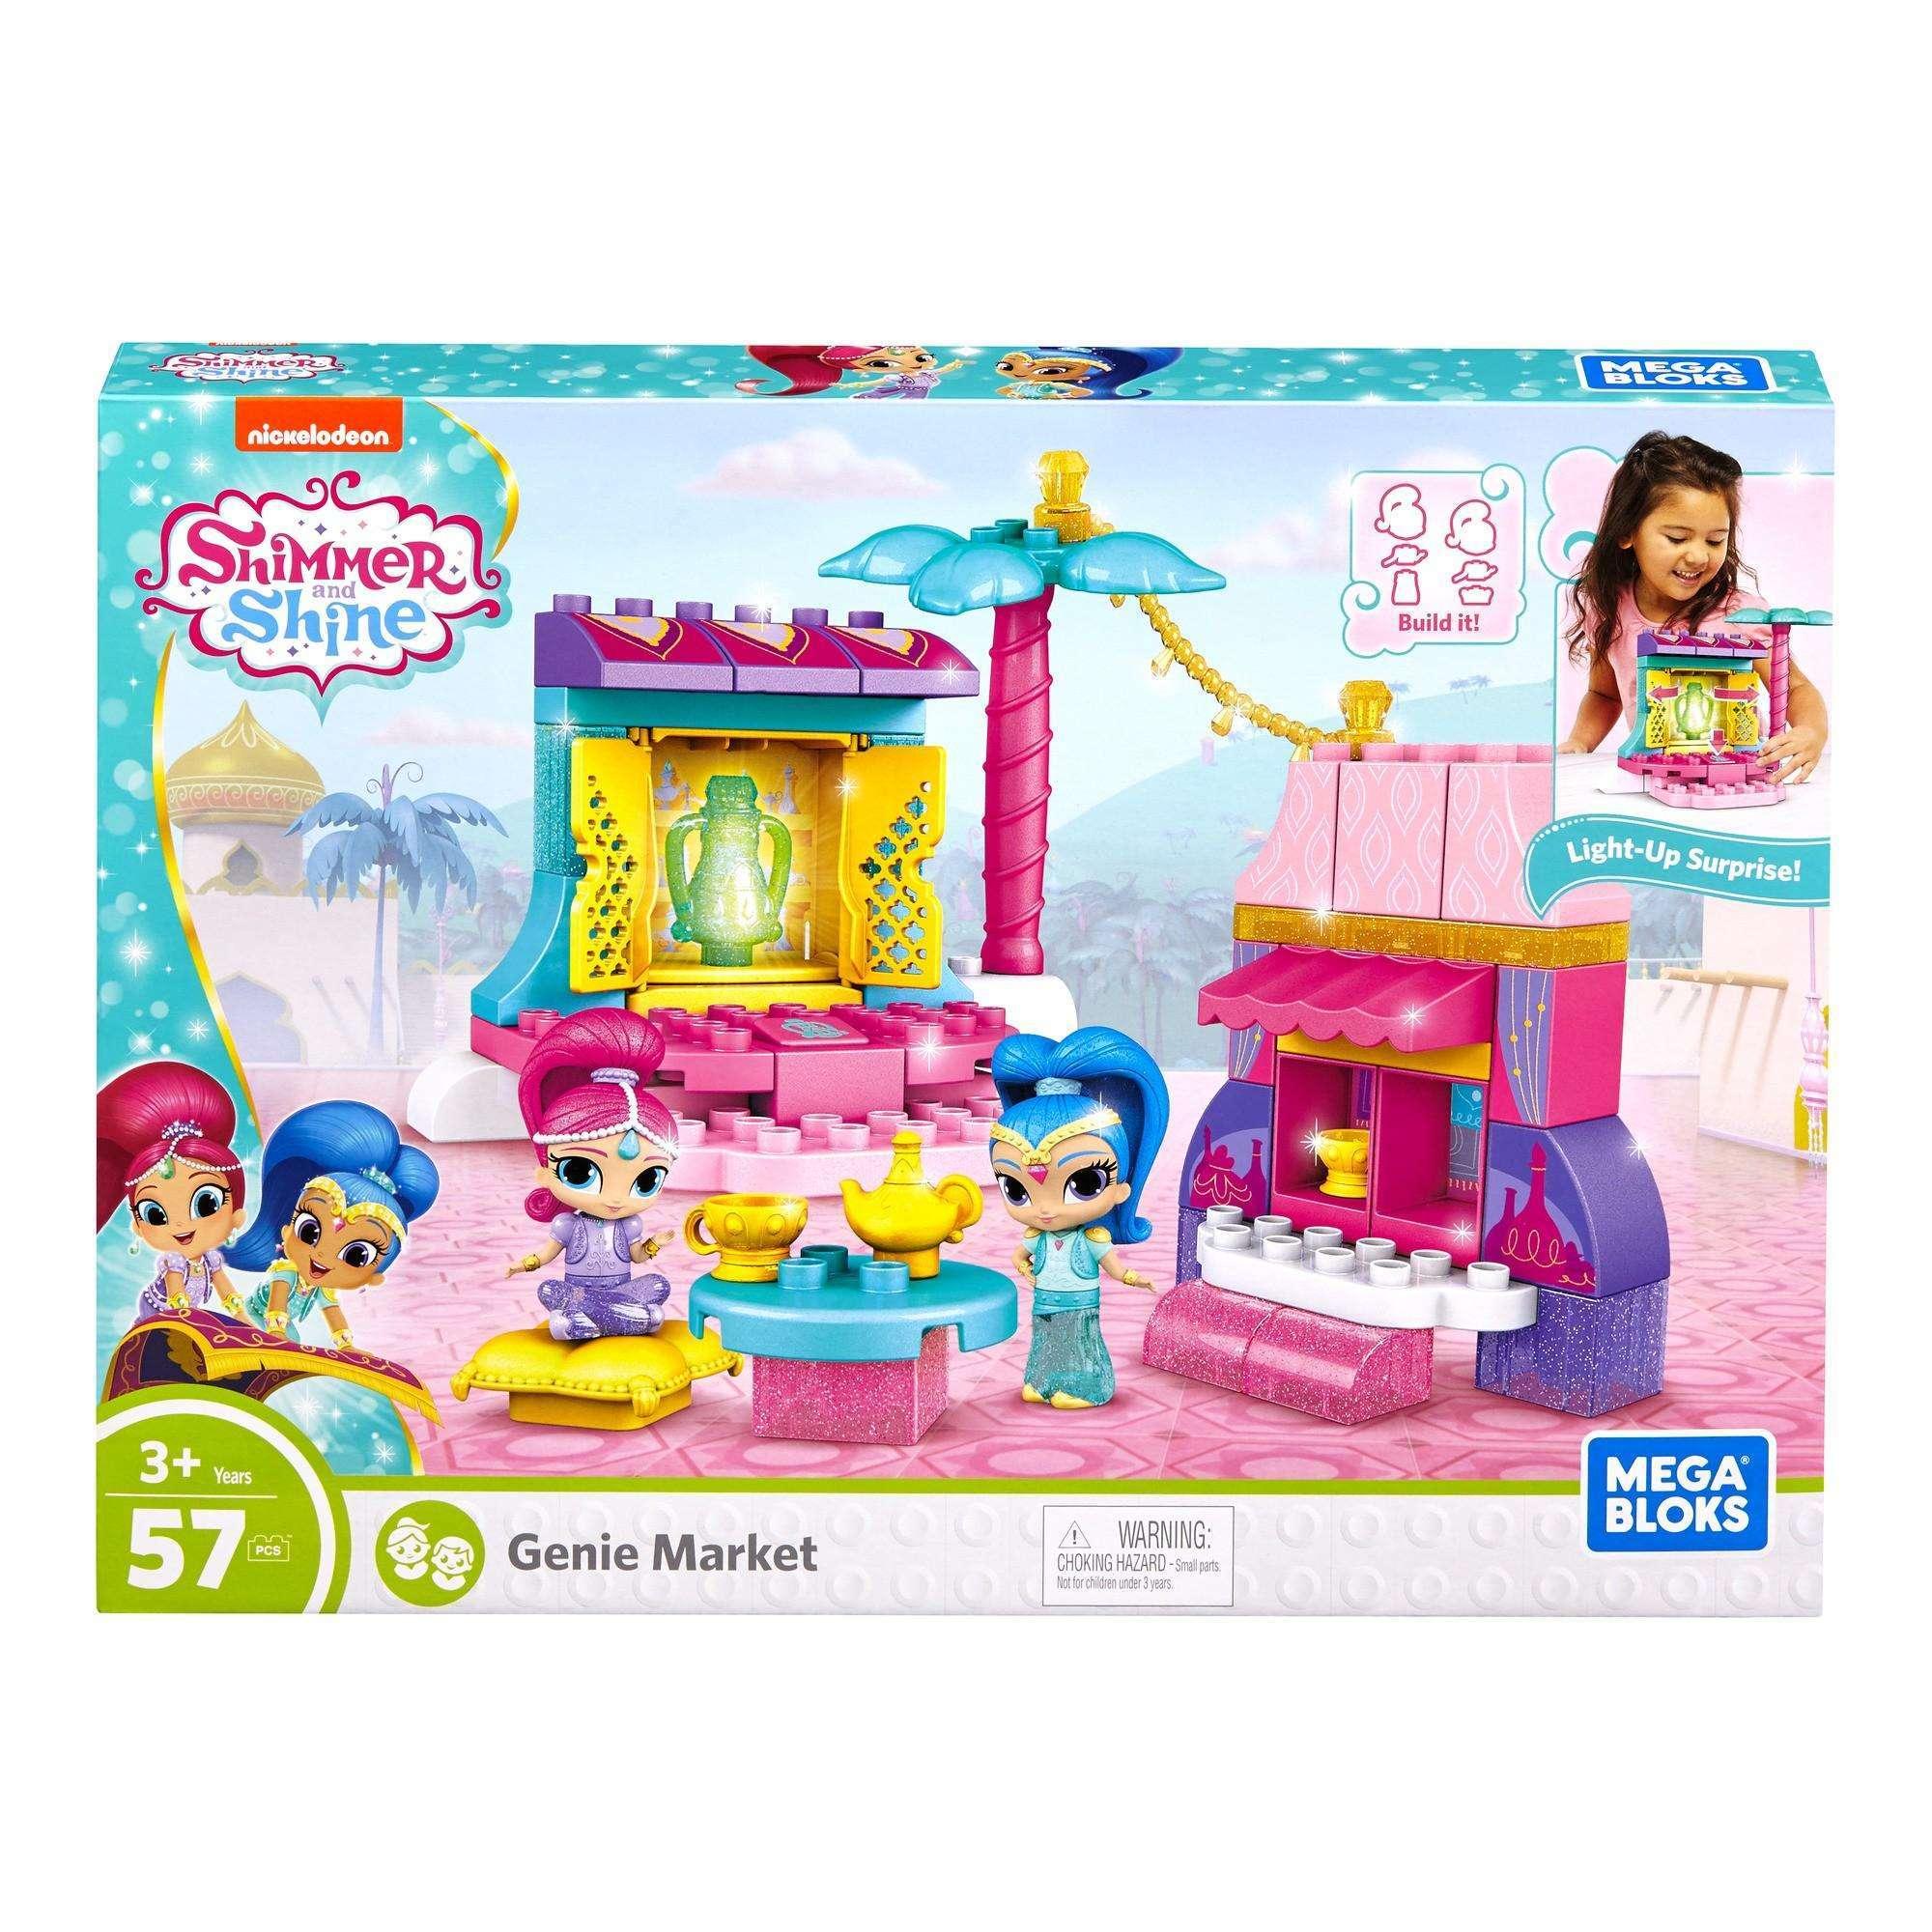 Mega Bloks Shimmer and Shine Genie Market